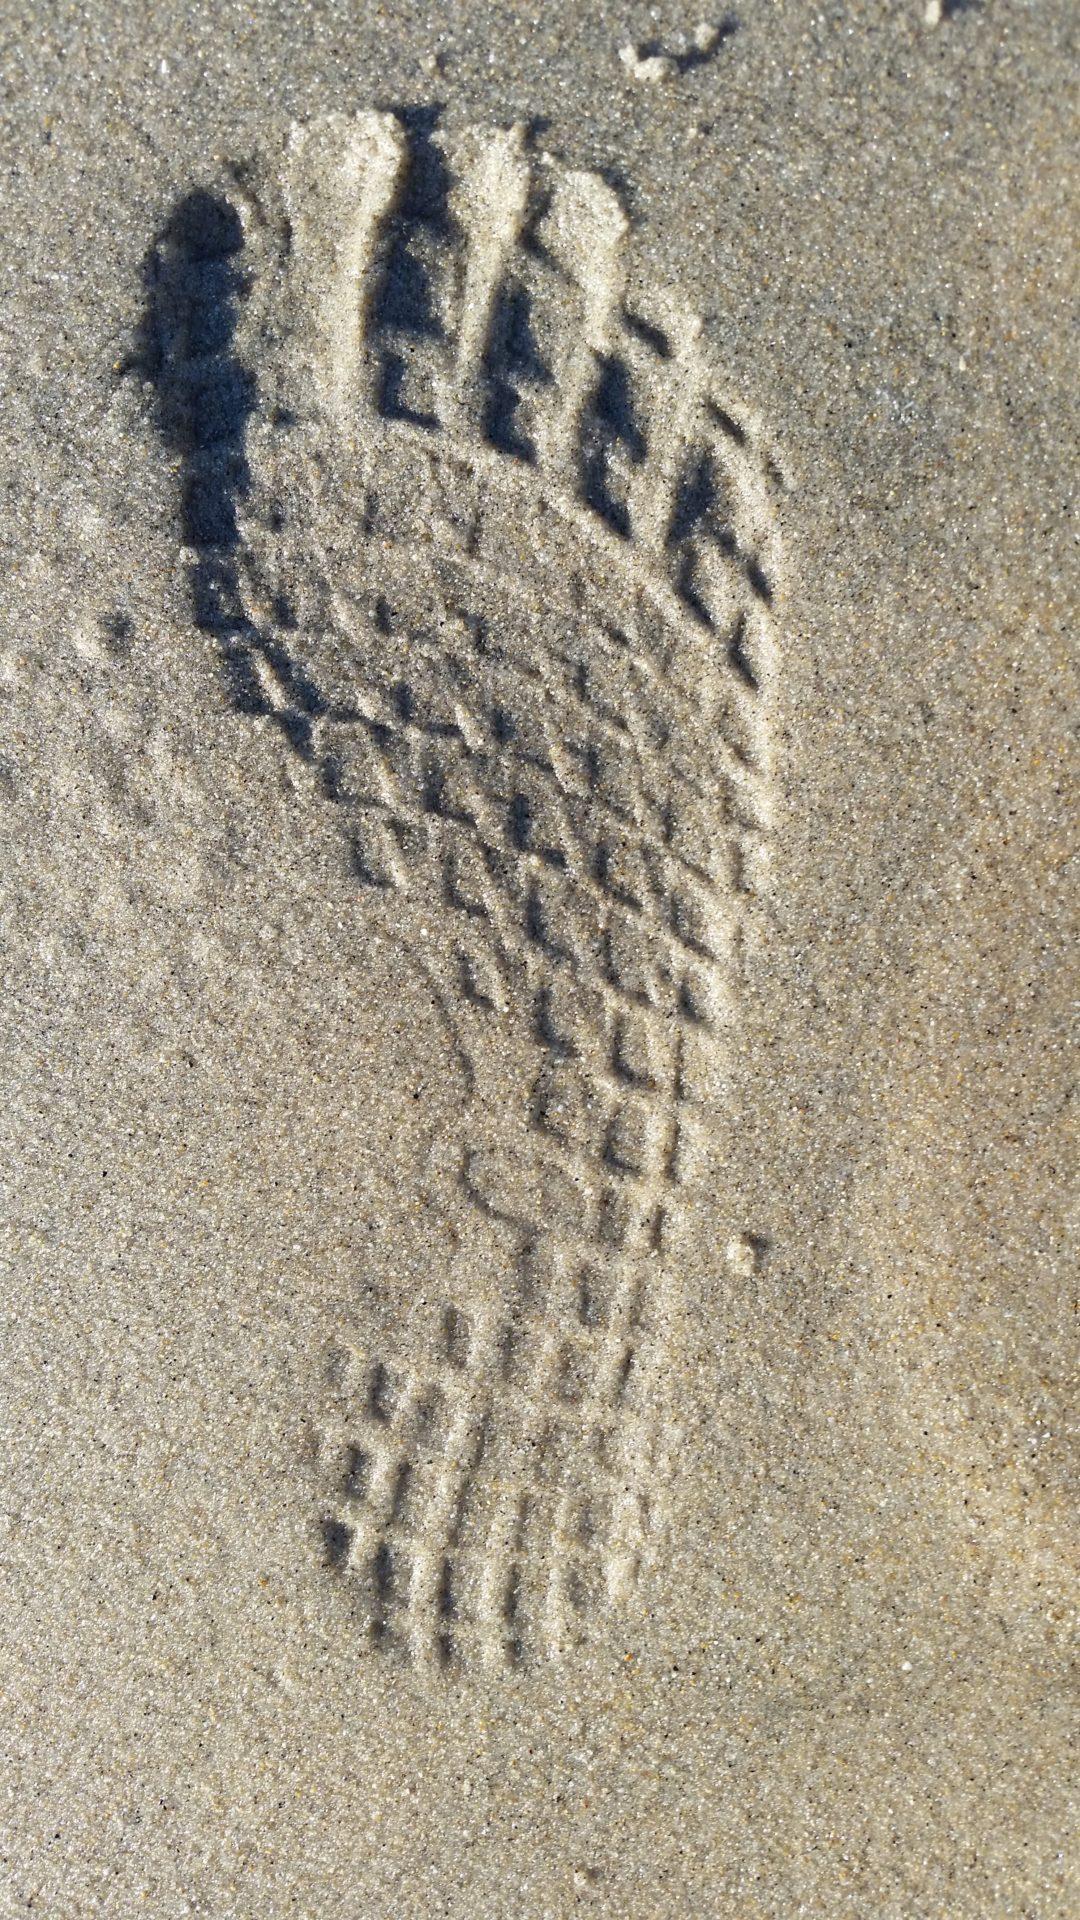 Footprint?